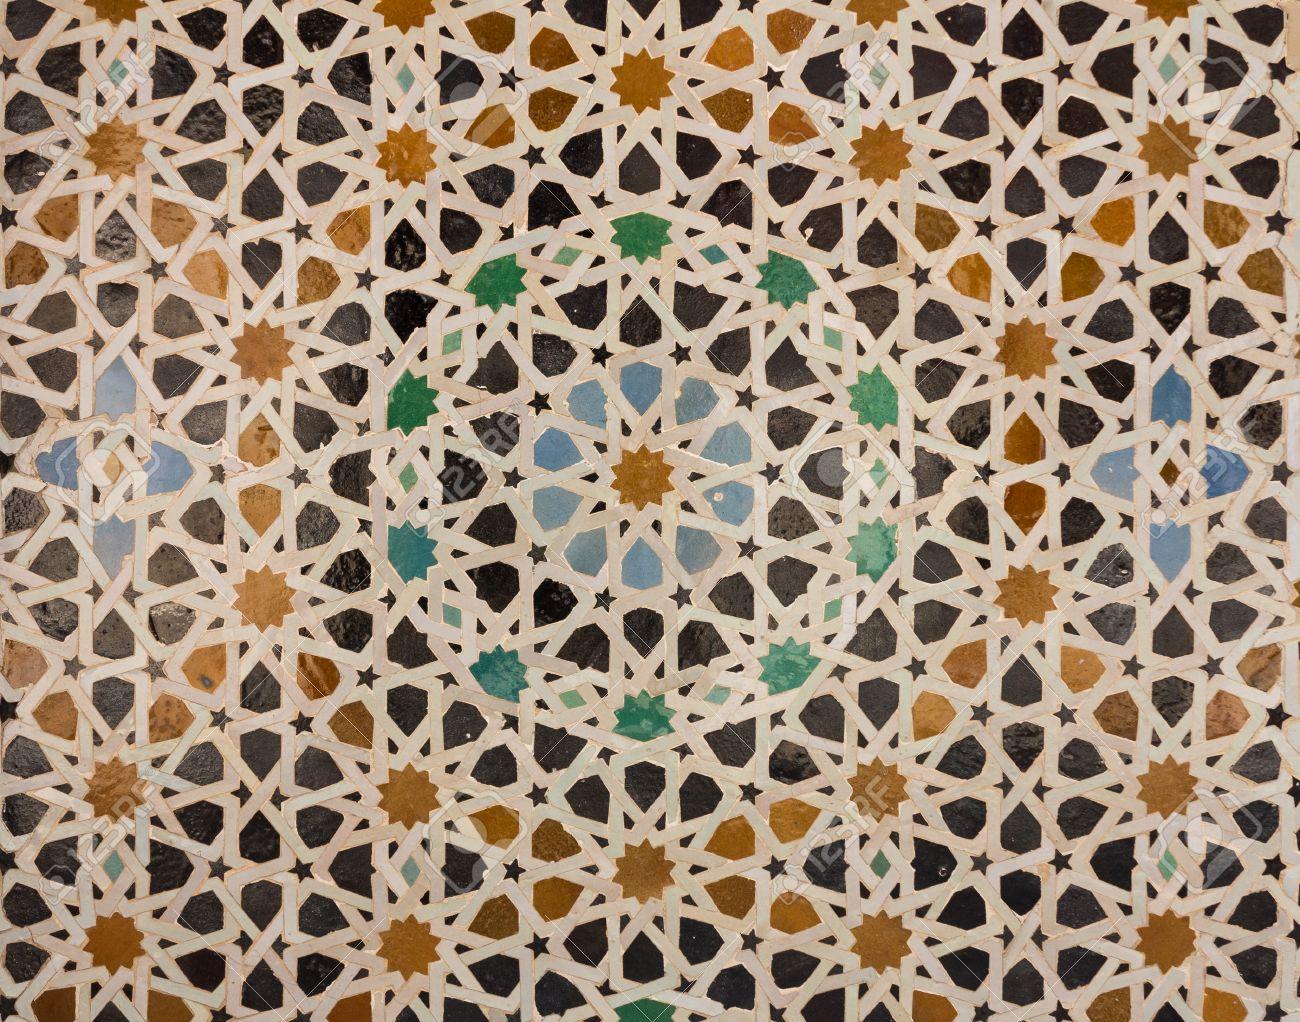 Tegels Met Patroon : Oosterse patroon mozaïek van tegels in een moskee in marokko